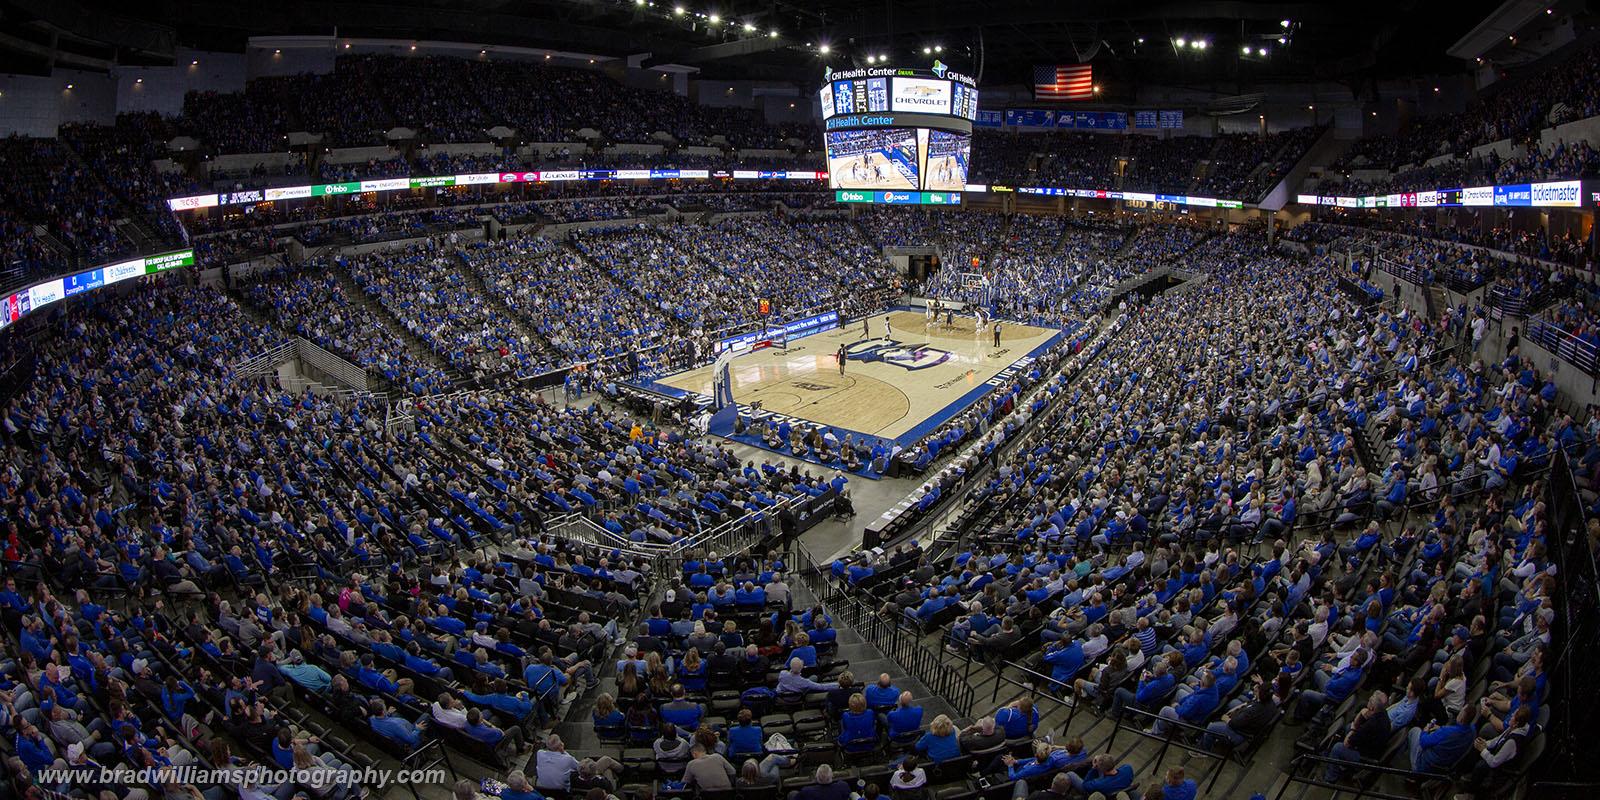 Creighton VS Georgetown 3/4/2020, Attendance = 17,696